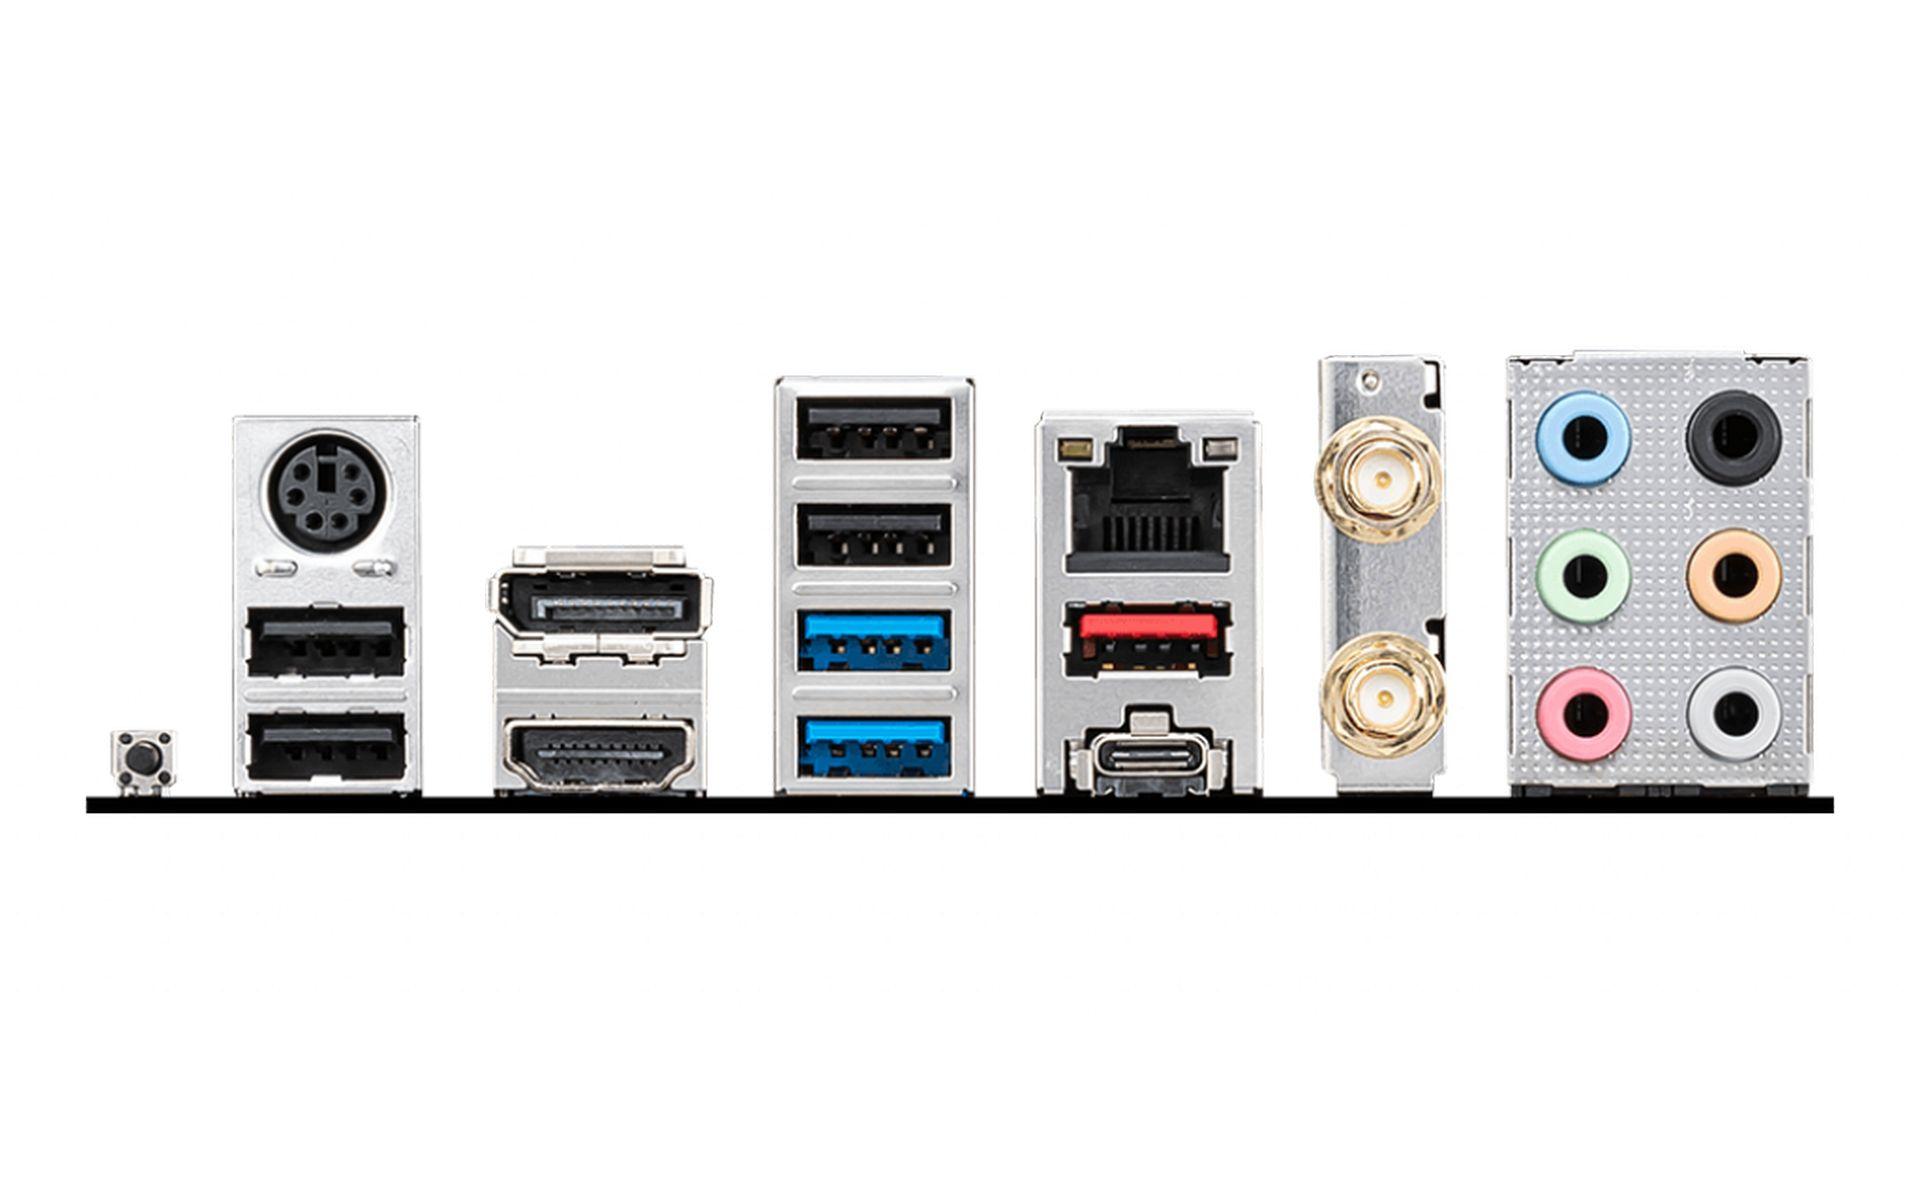 Mainboard MSI Z590 PRO WIFI Tối đa hóa hiệu suất USB